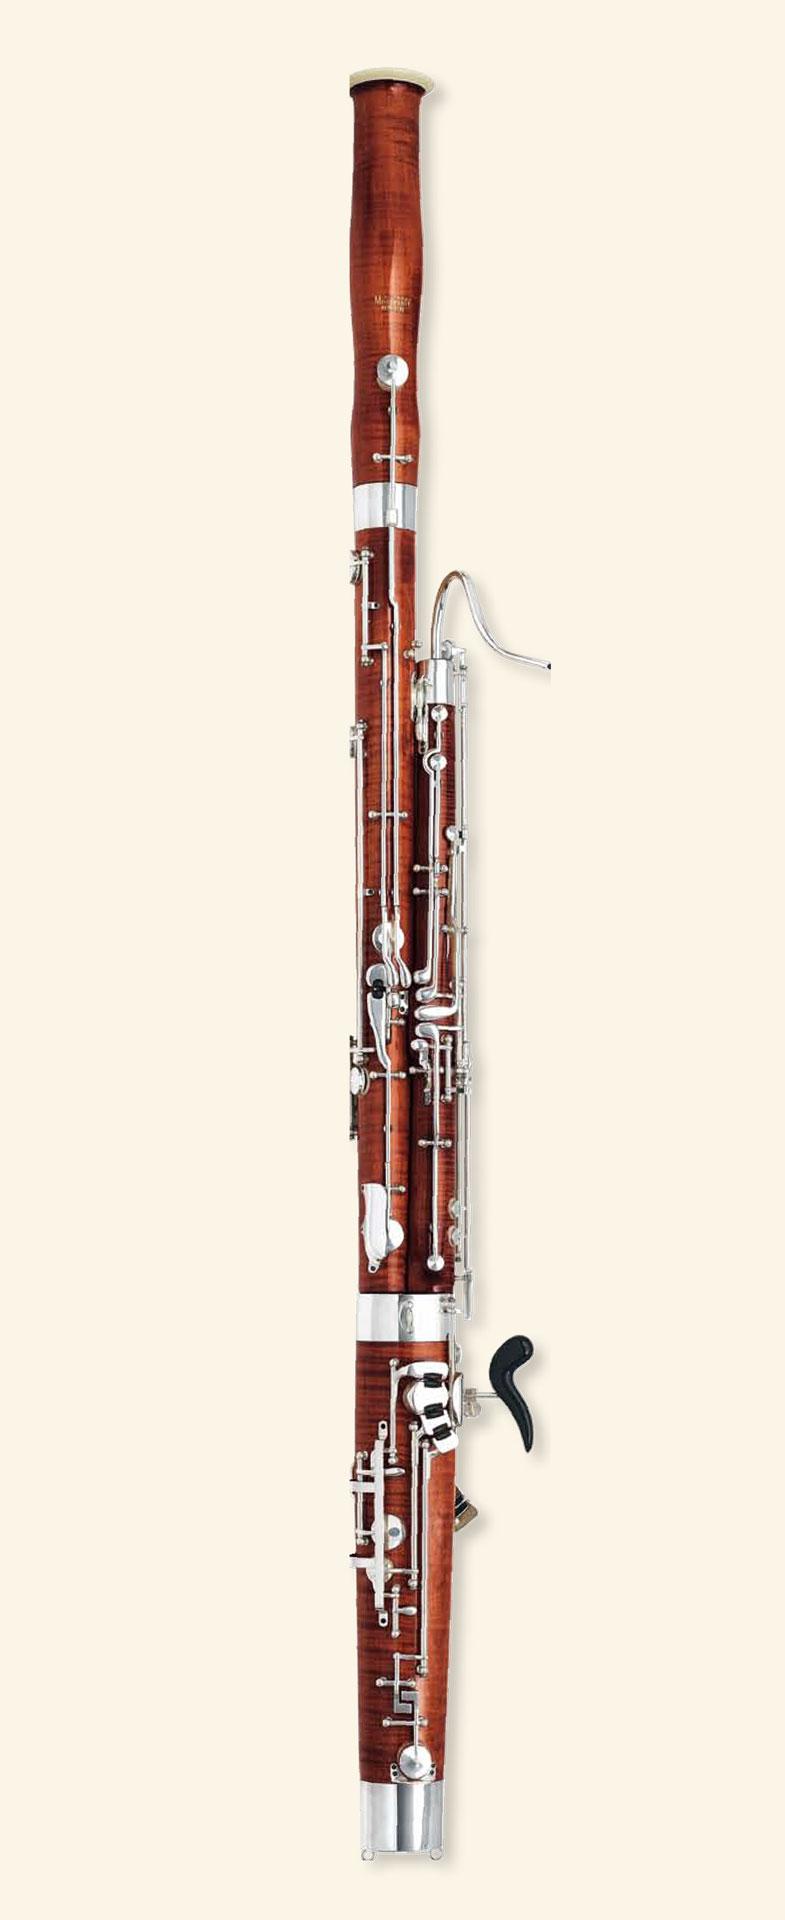 Fogott 222 Pro E - Instrumente